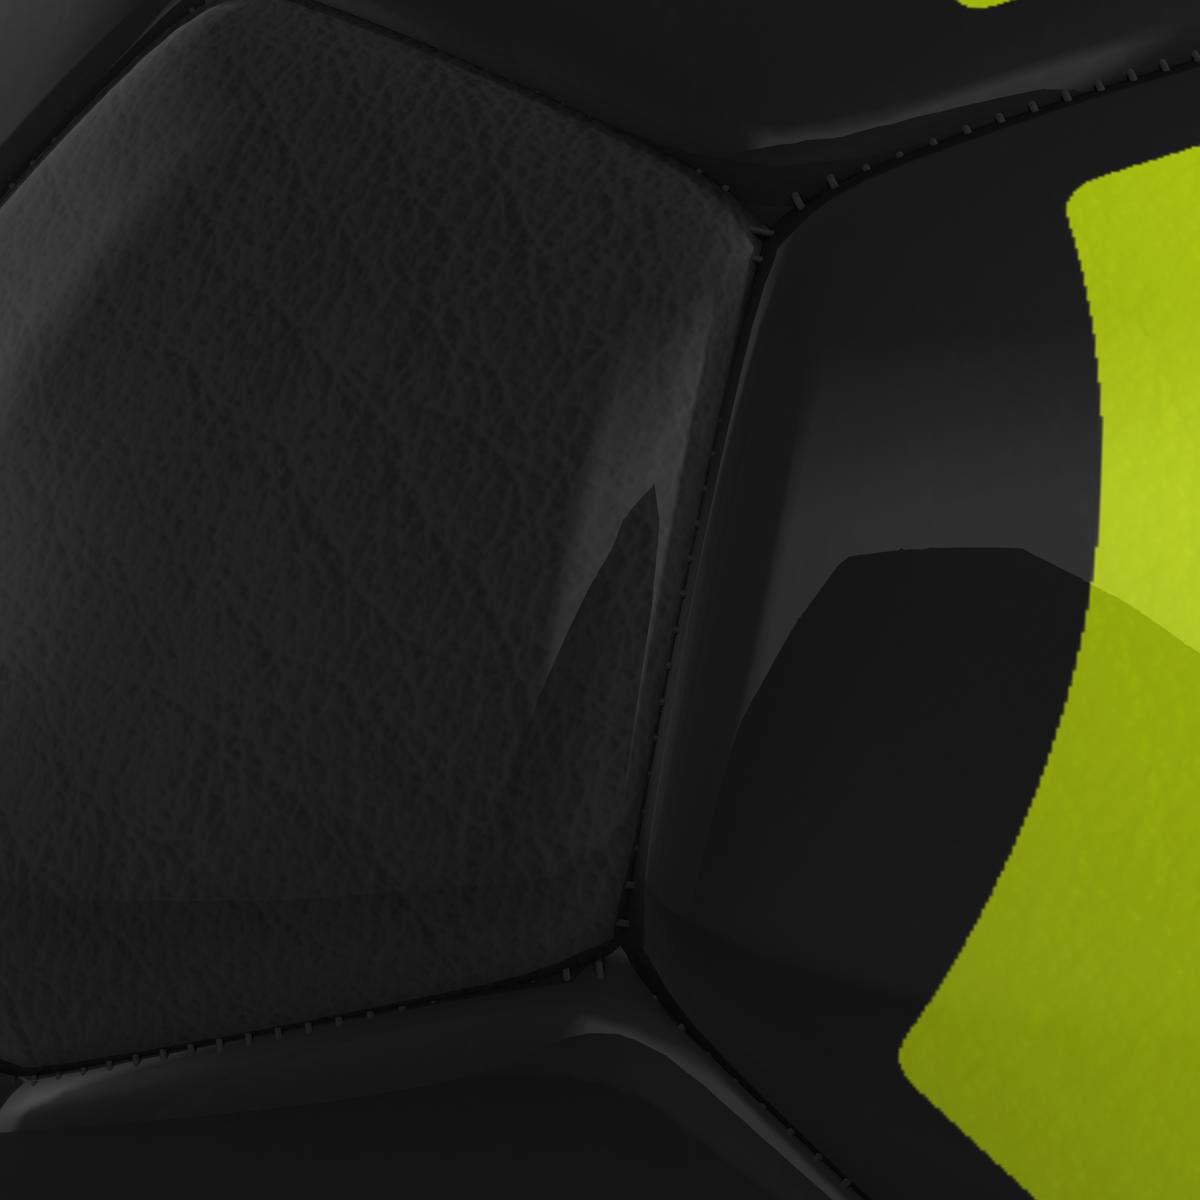 soccerball хар шар 3d загвар 3ds max fbx c4d ma mb obj 204210